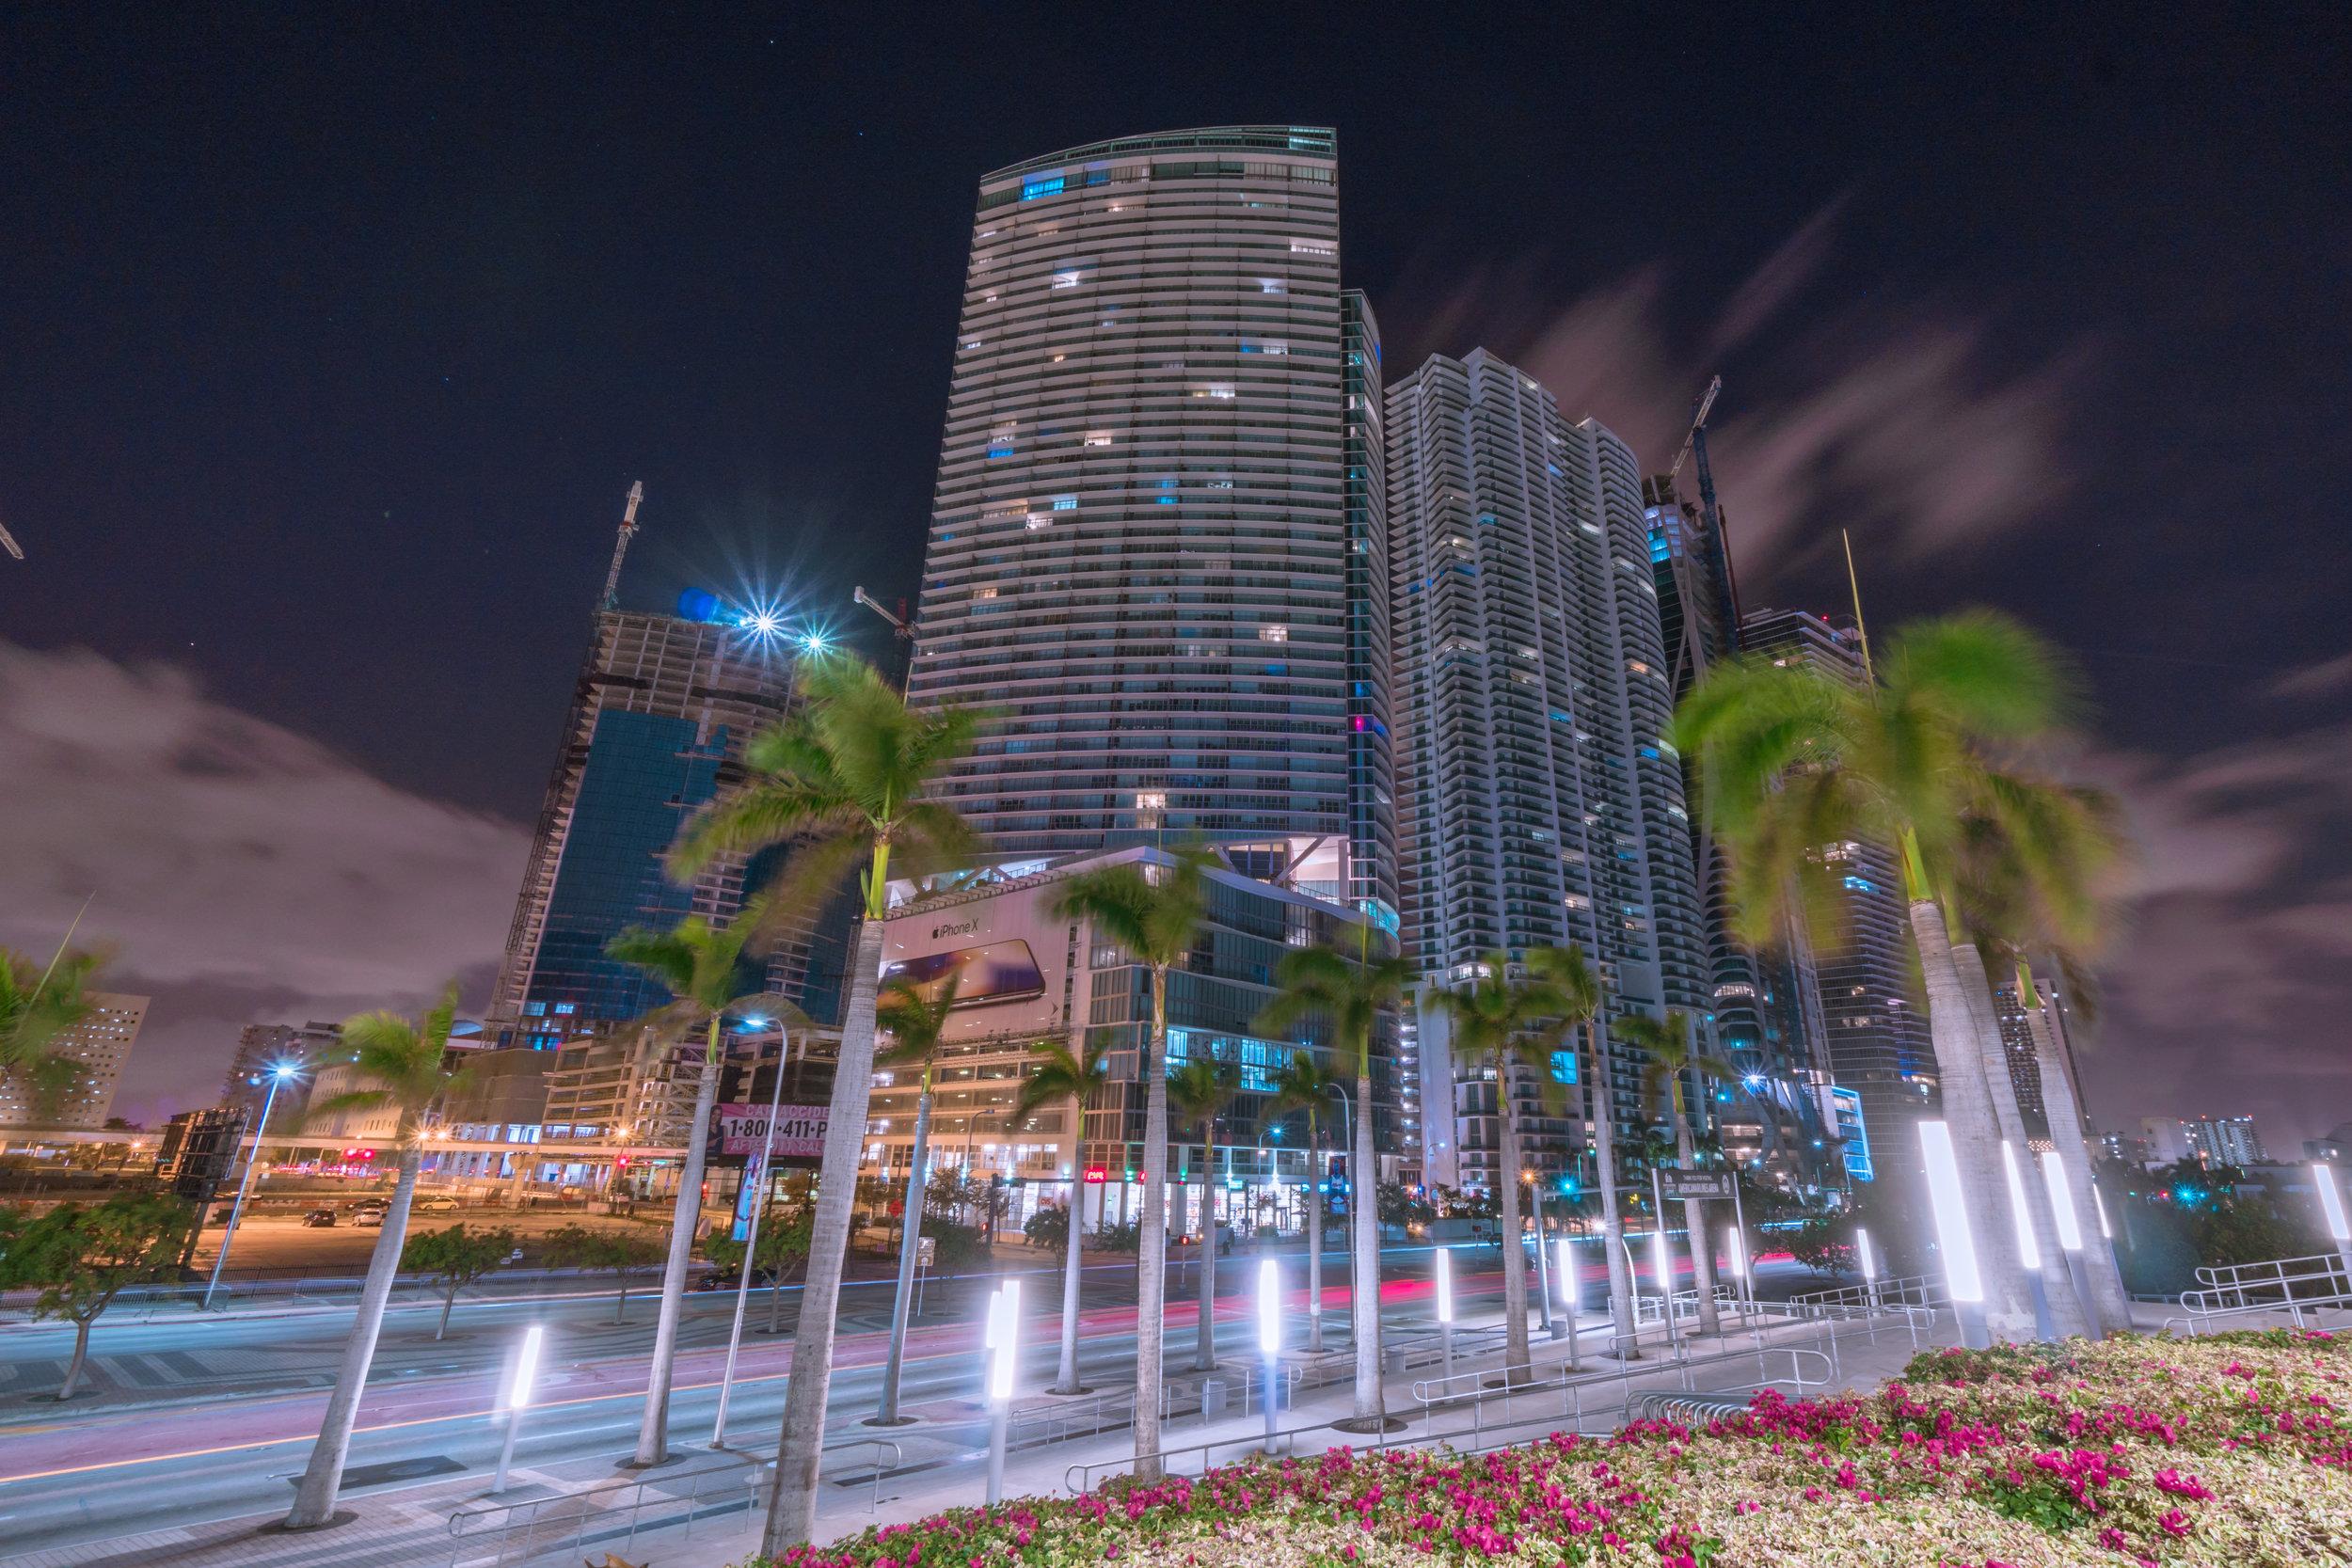 downtown - palm long expo_.jpg